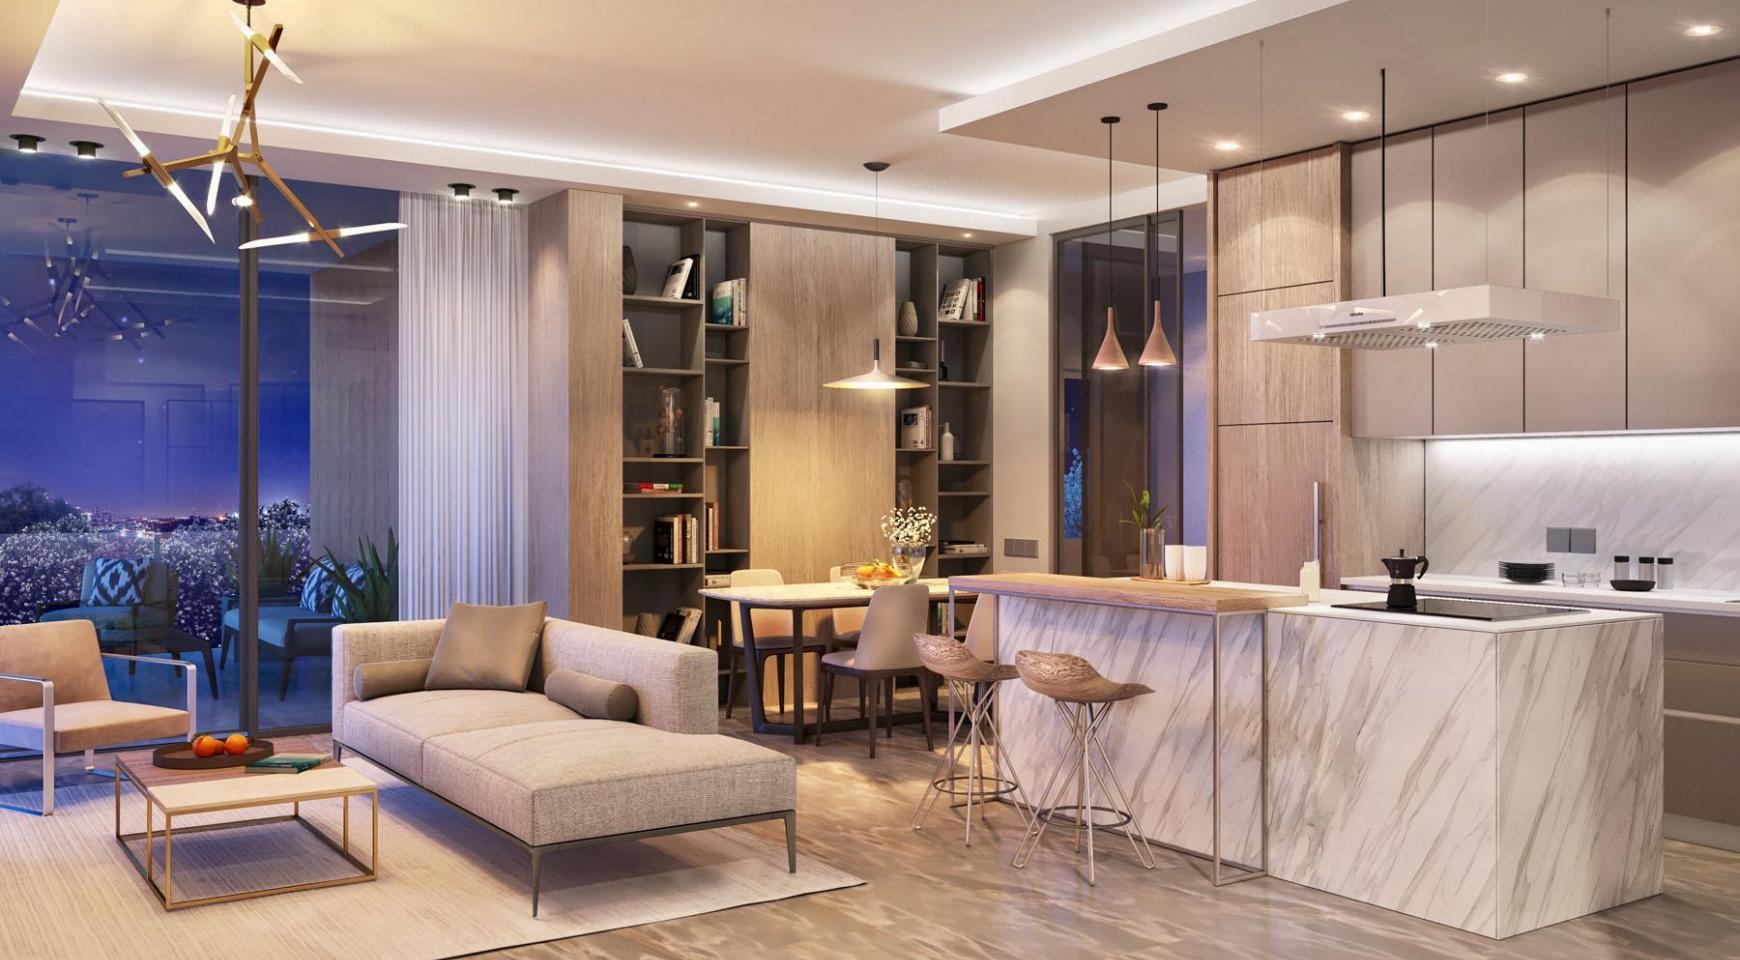 Contemporary 3 Bedroom Apartment in a New Complex near the Sea - 1